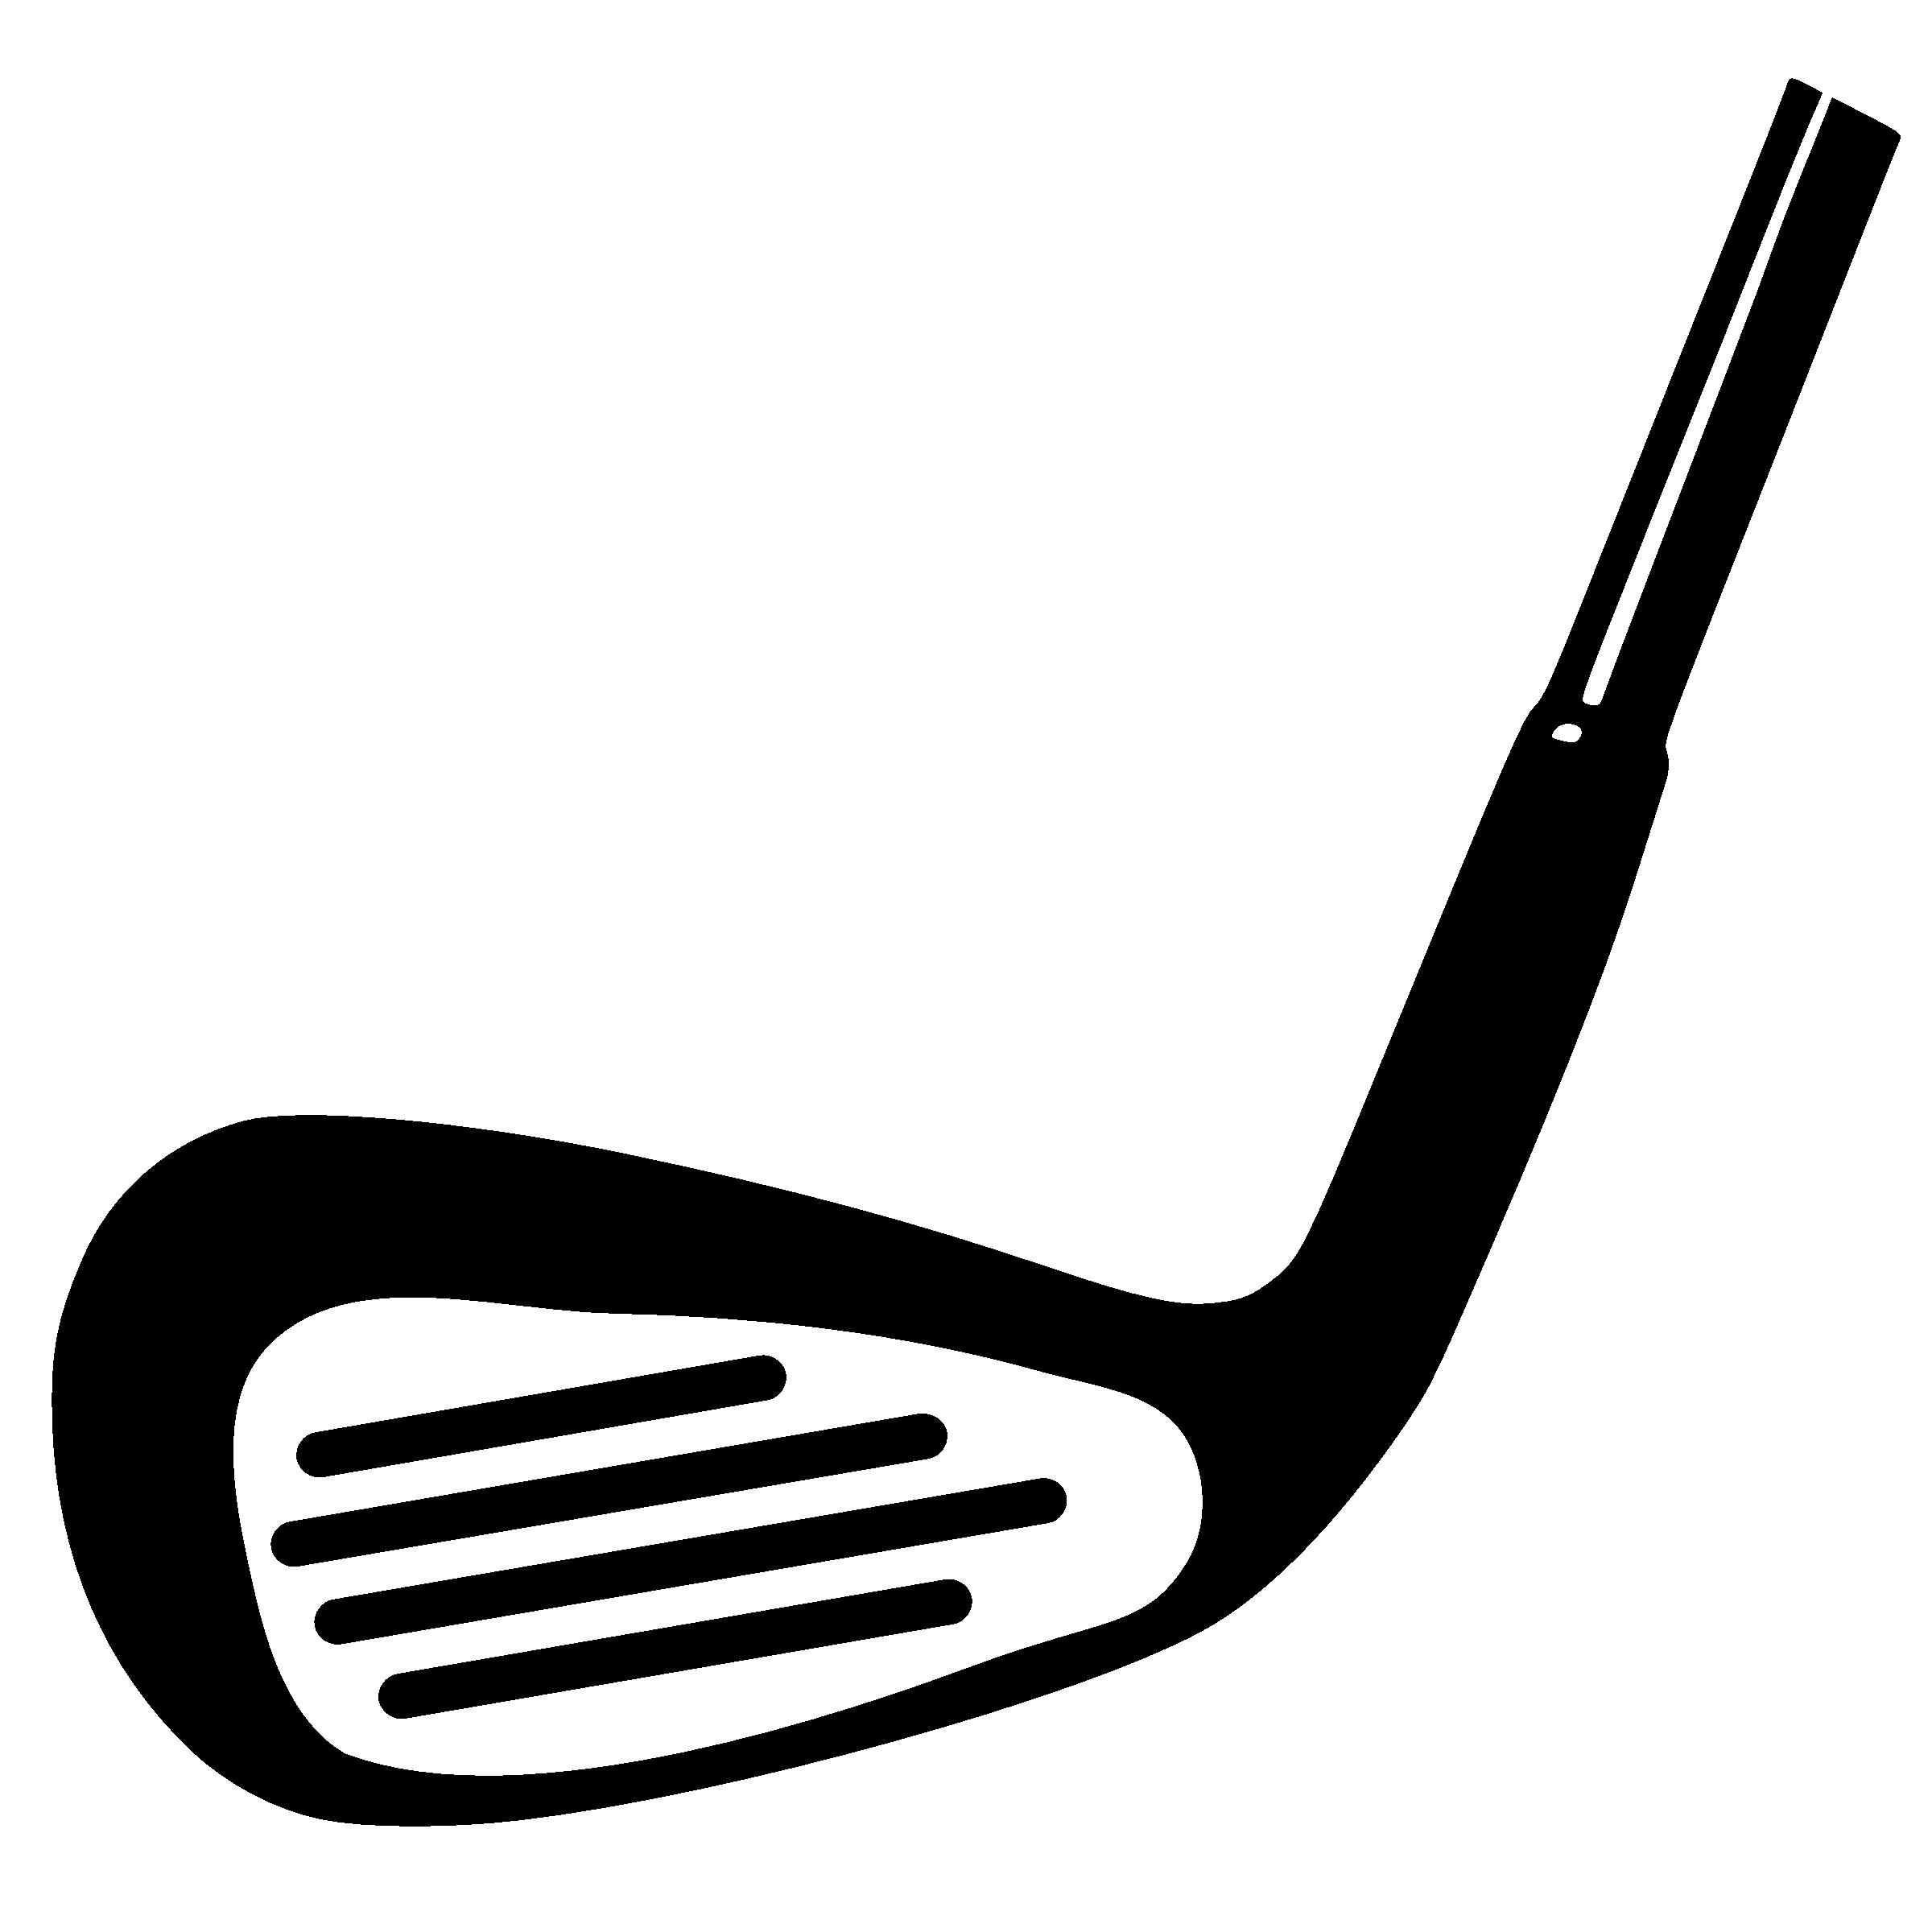 2400x2400 Golf Silhouette Clipart 2